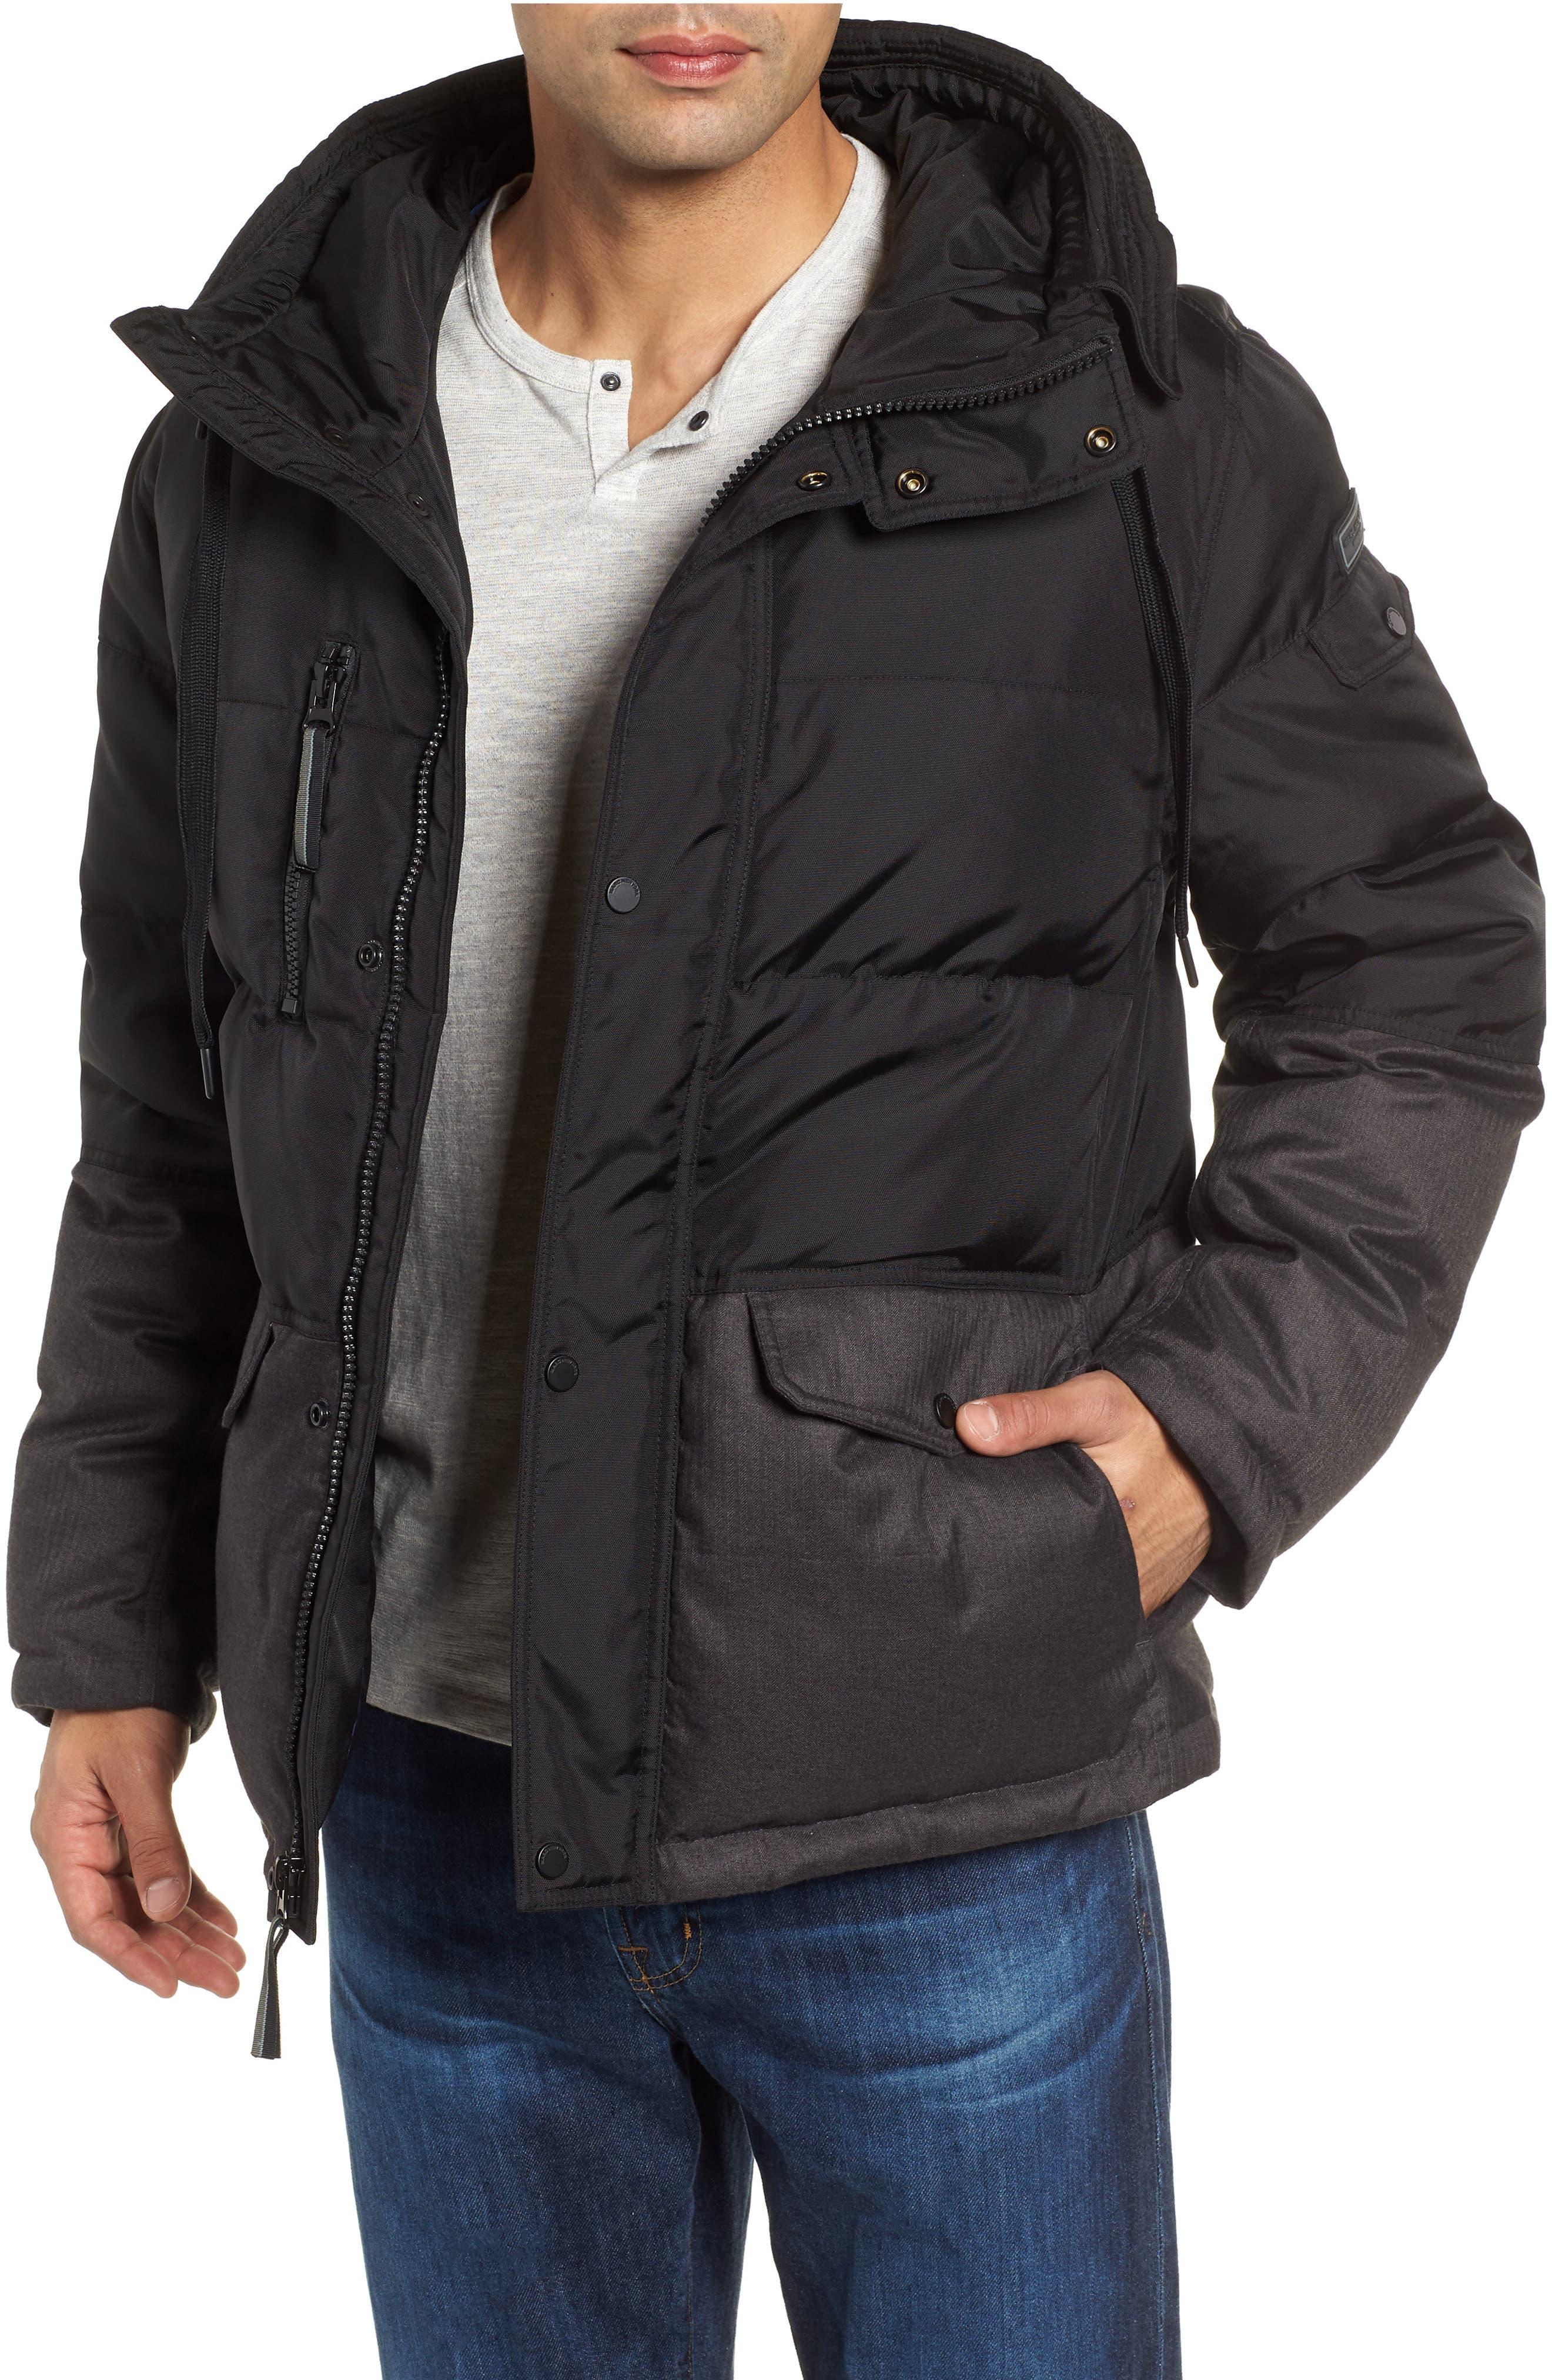 MARC NEW YORK Stanton Oxford Puffer Jacket, Main, color, BLACK